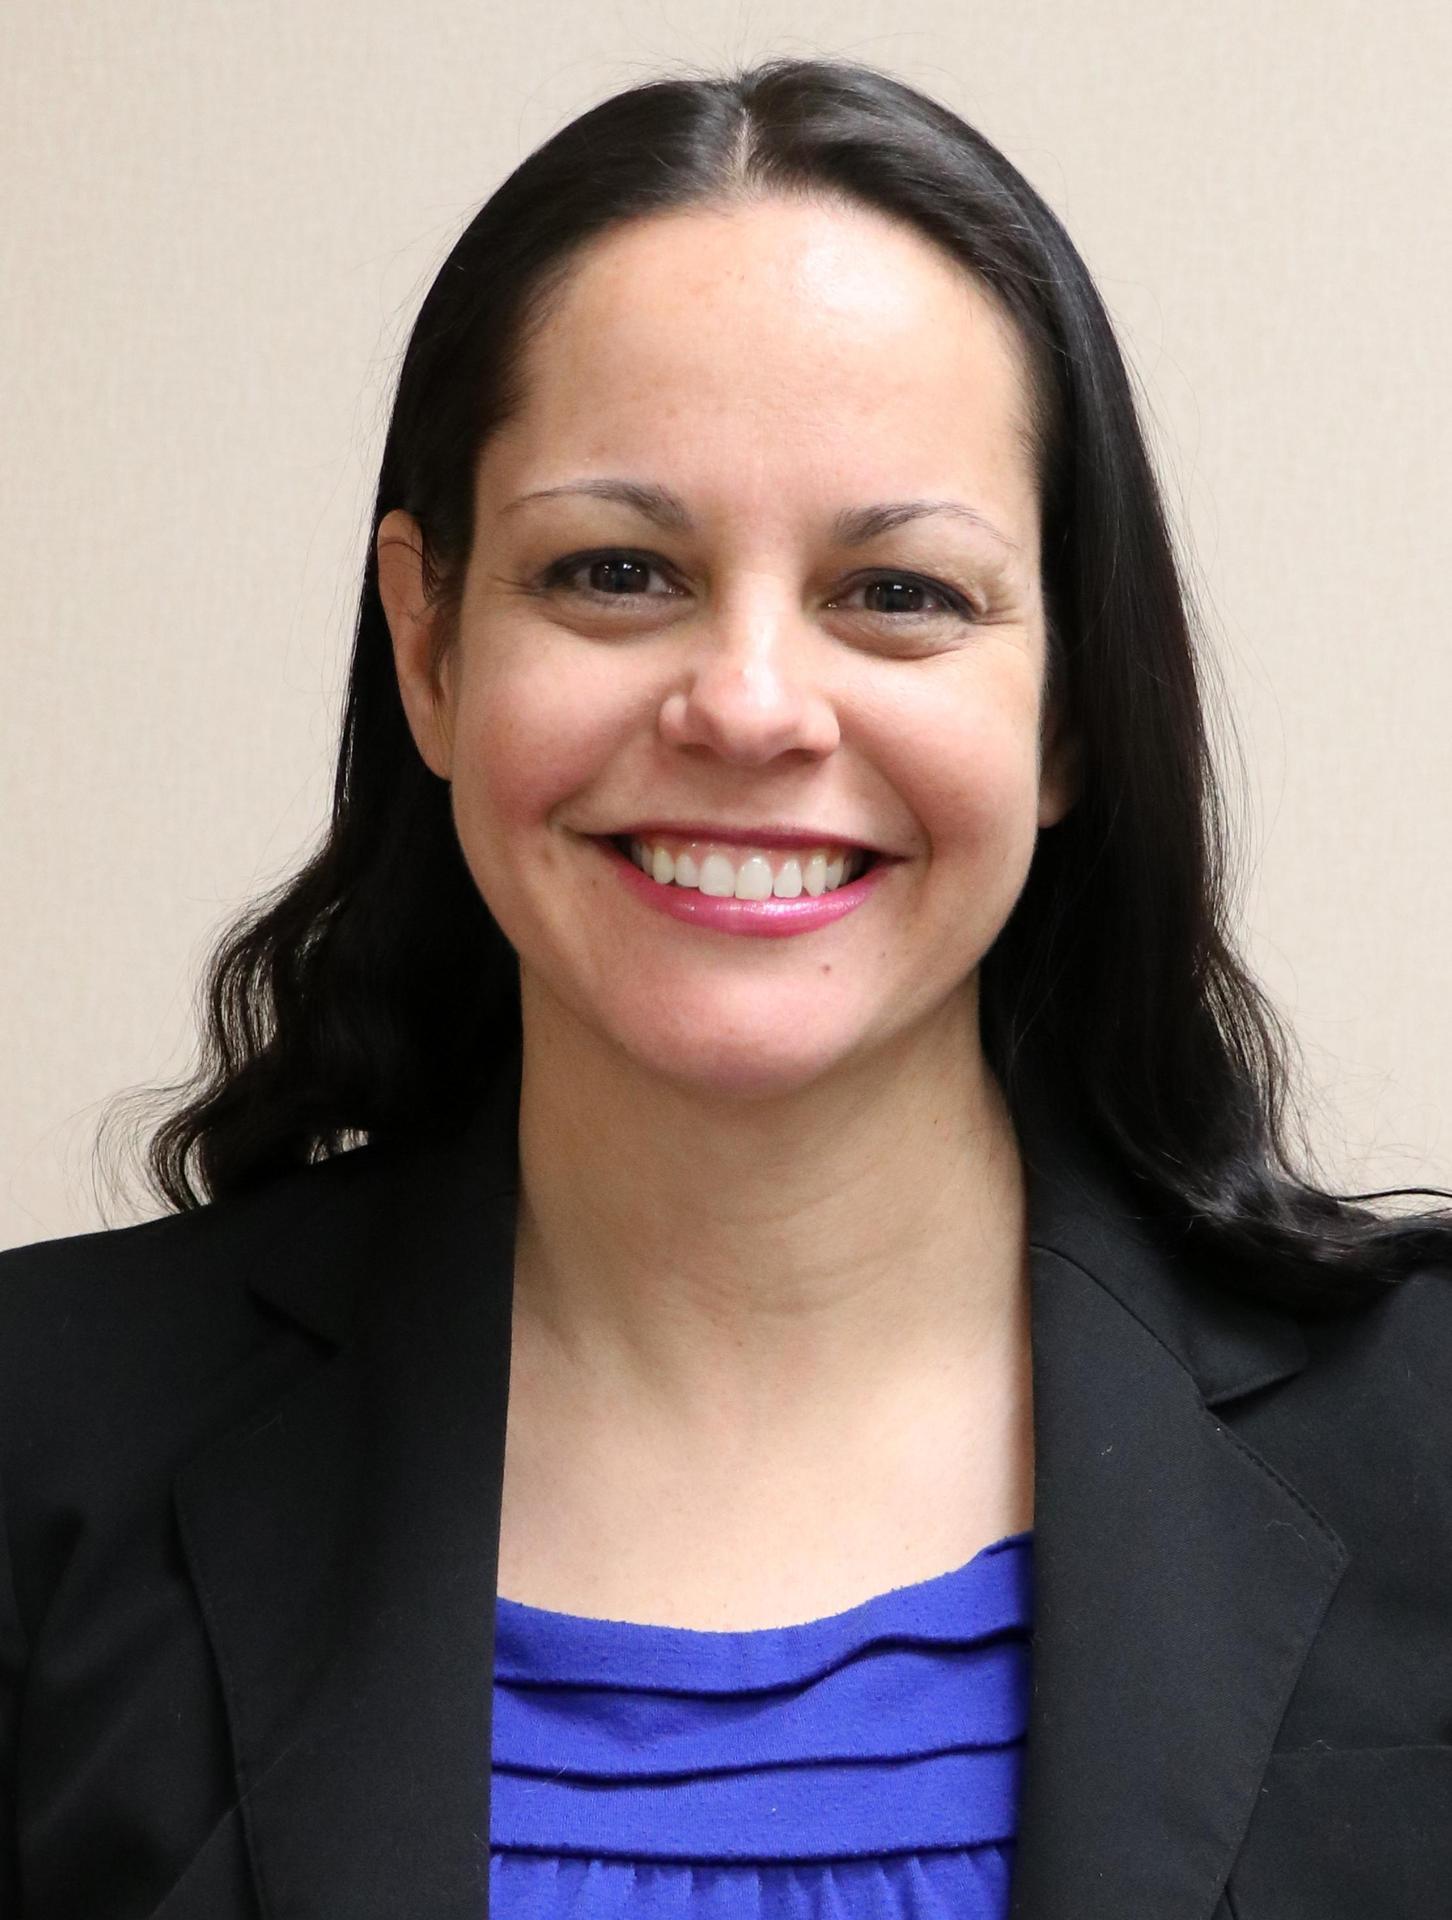 LeAnne Perkowski, Administrative Assistant